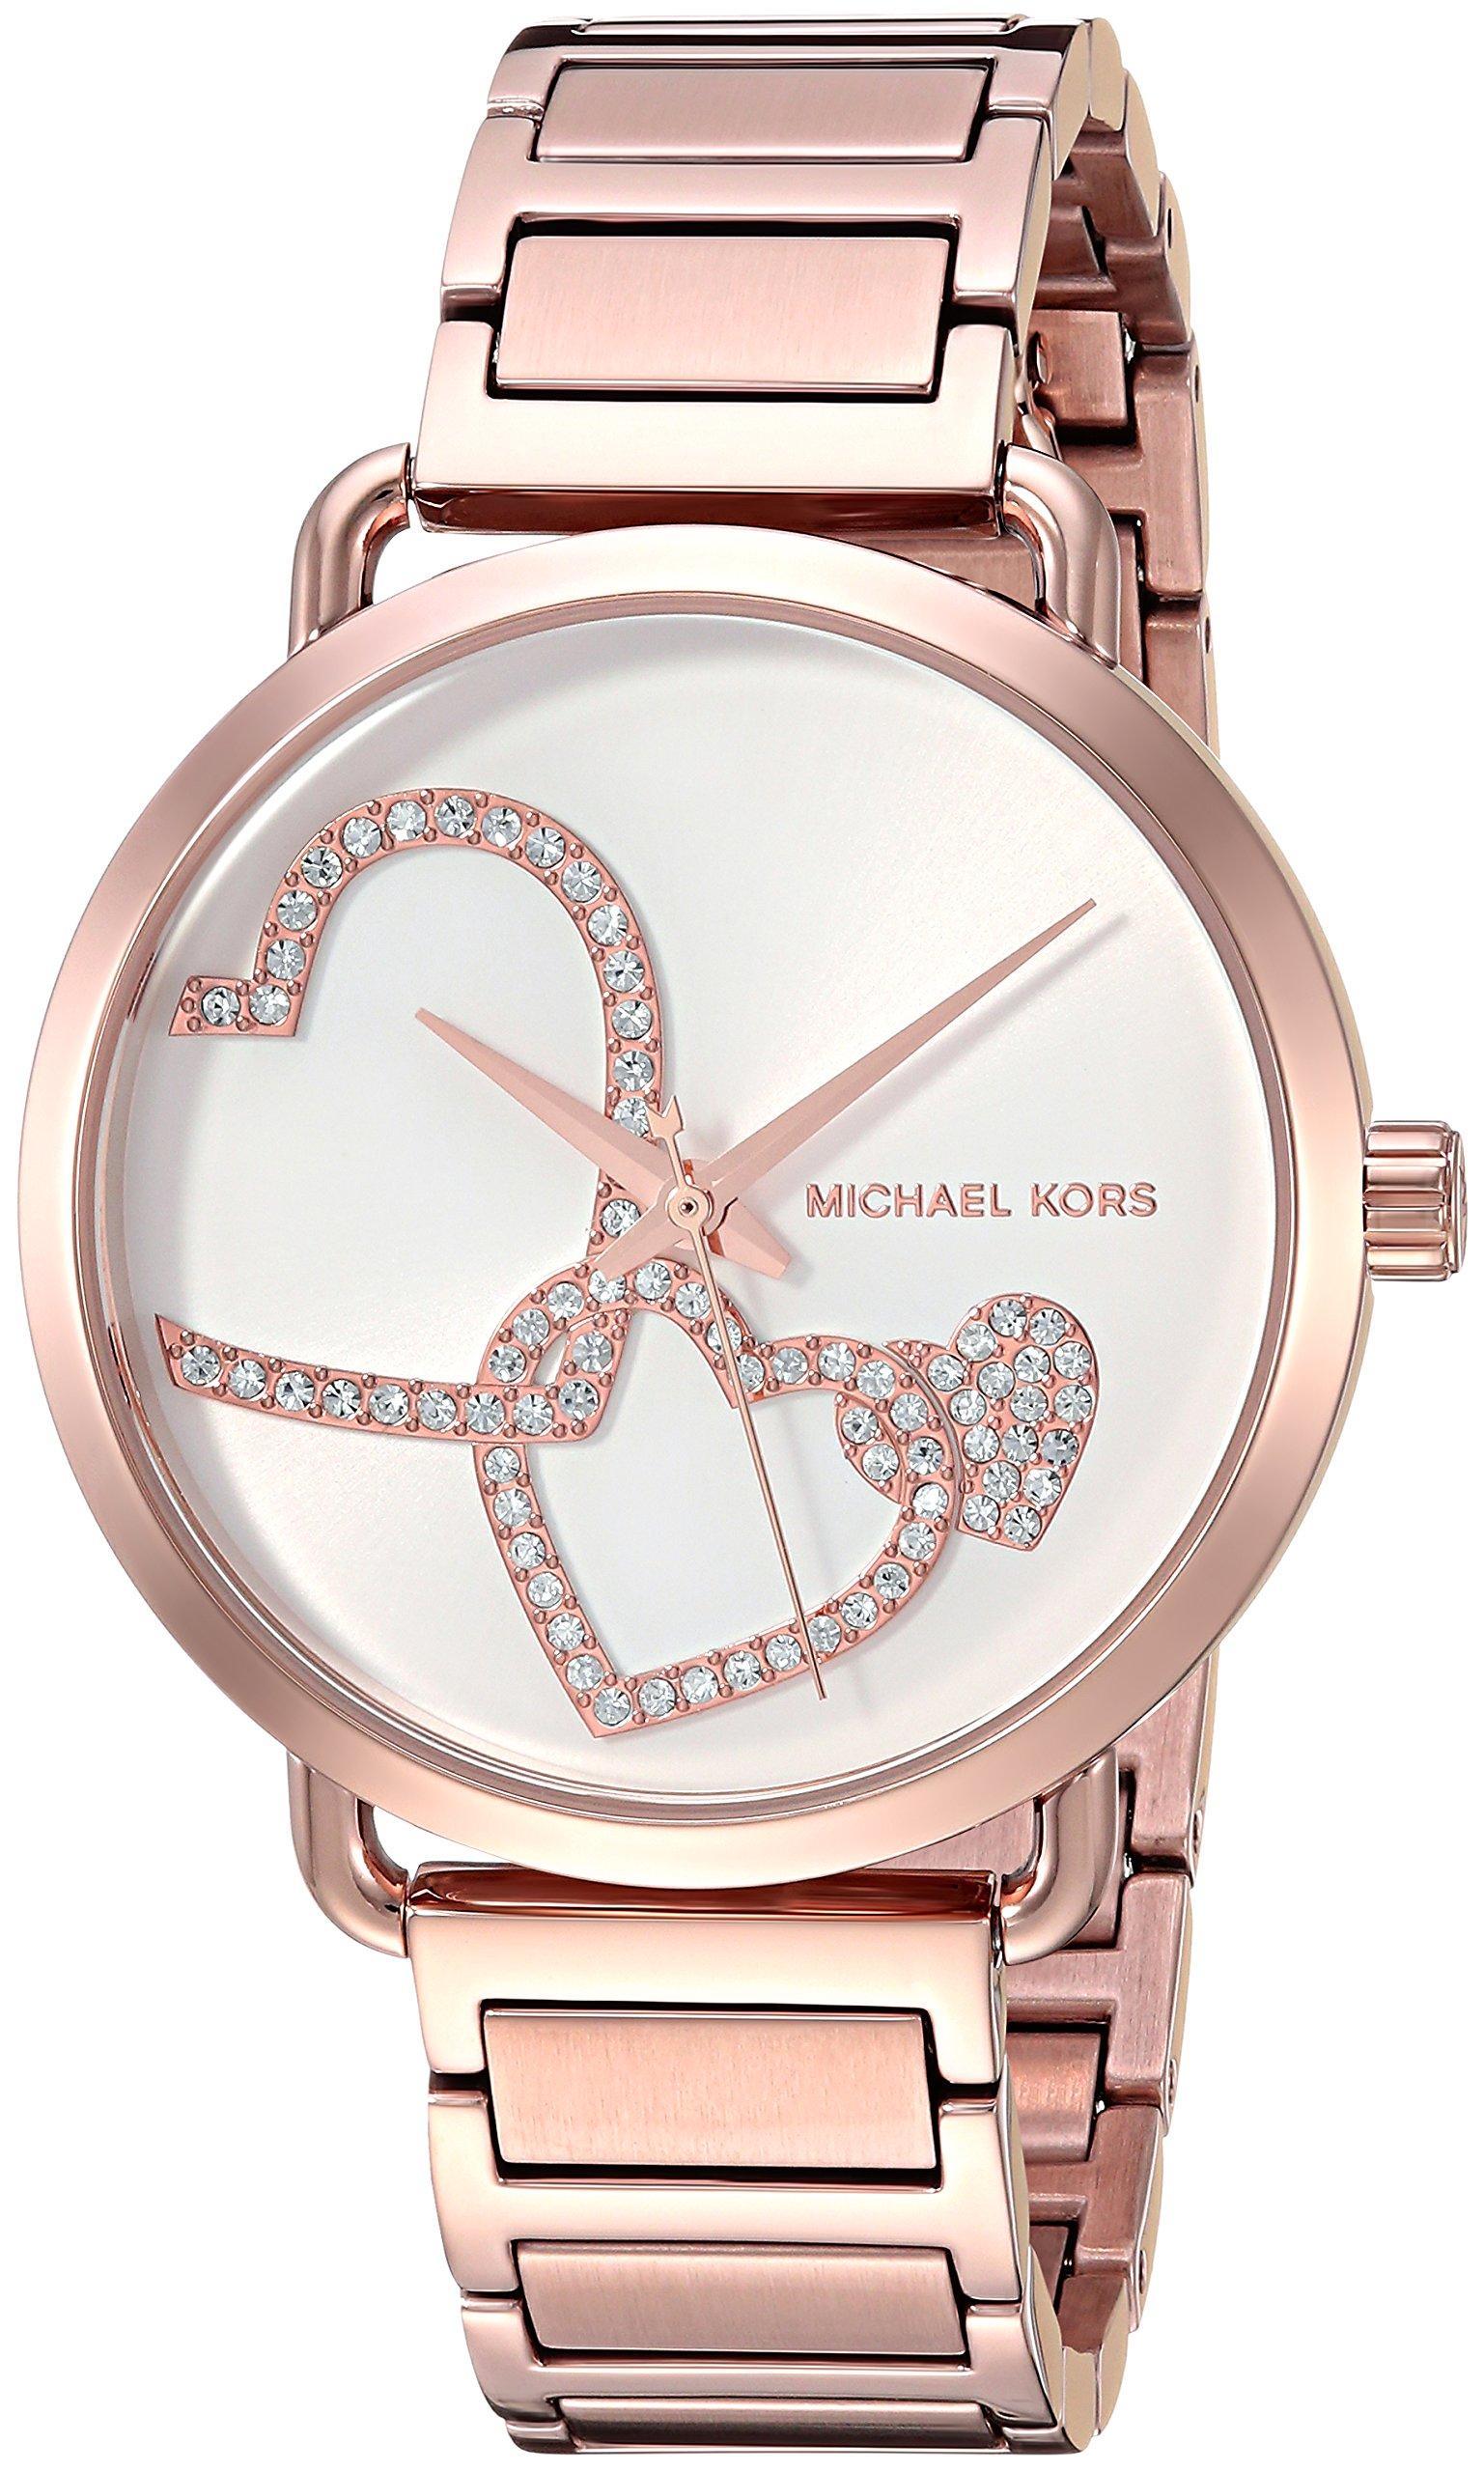 Michael Kors Women's Portia Analog Display Analog Quartz Rose Gold Watch MK3825